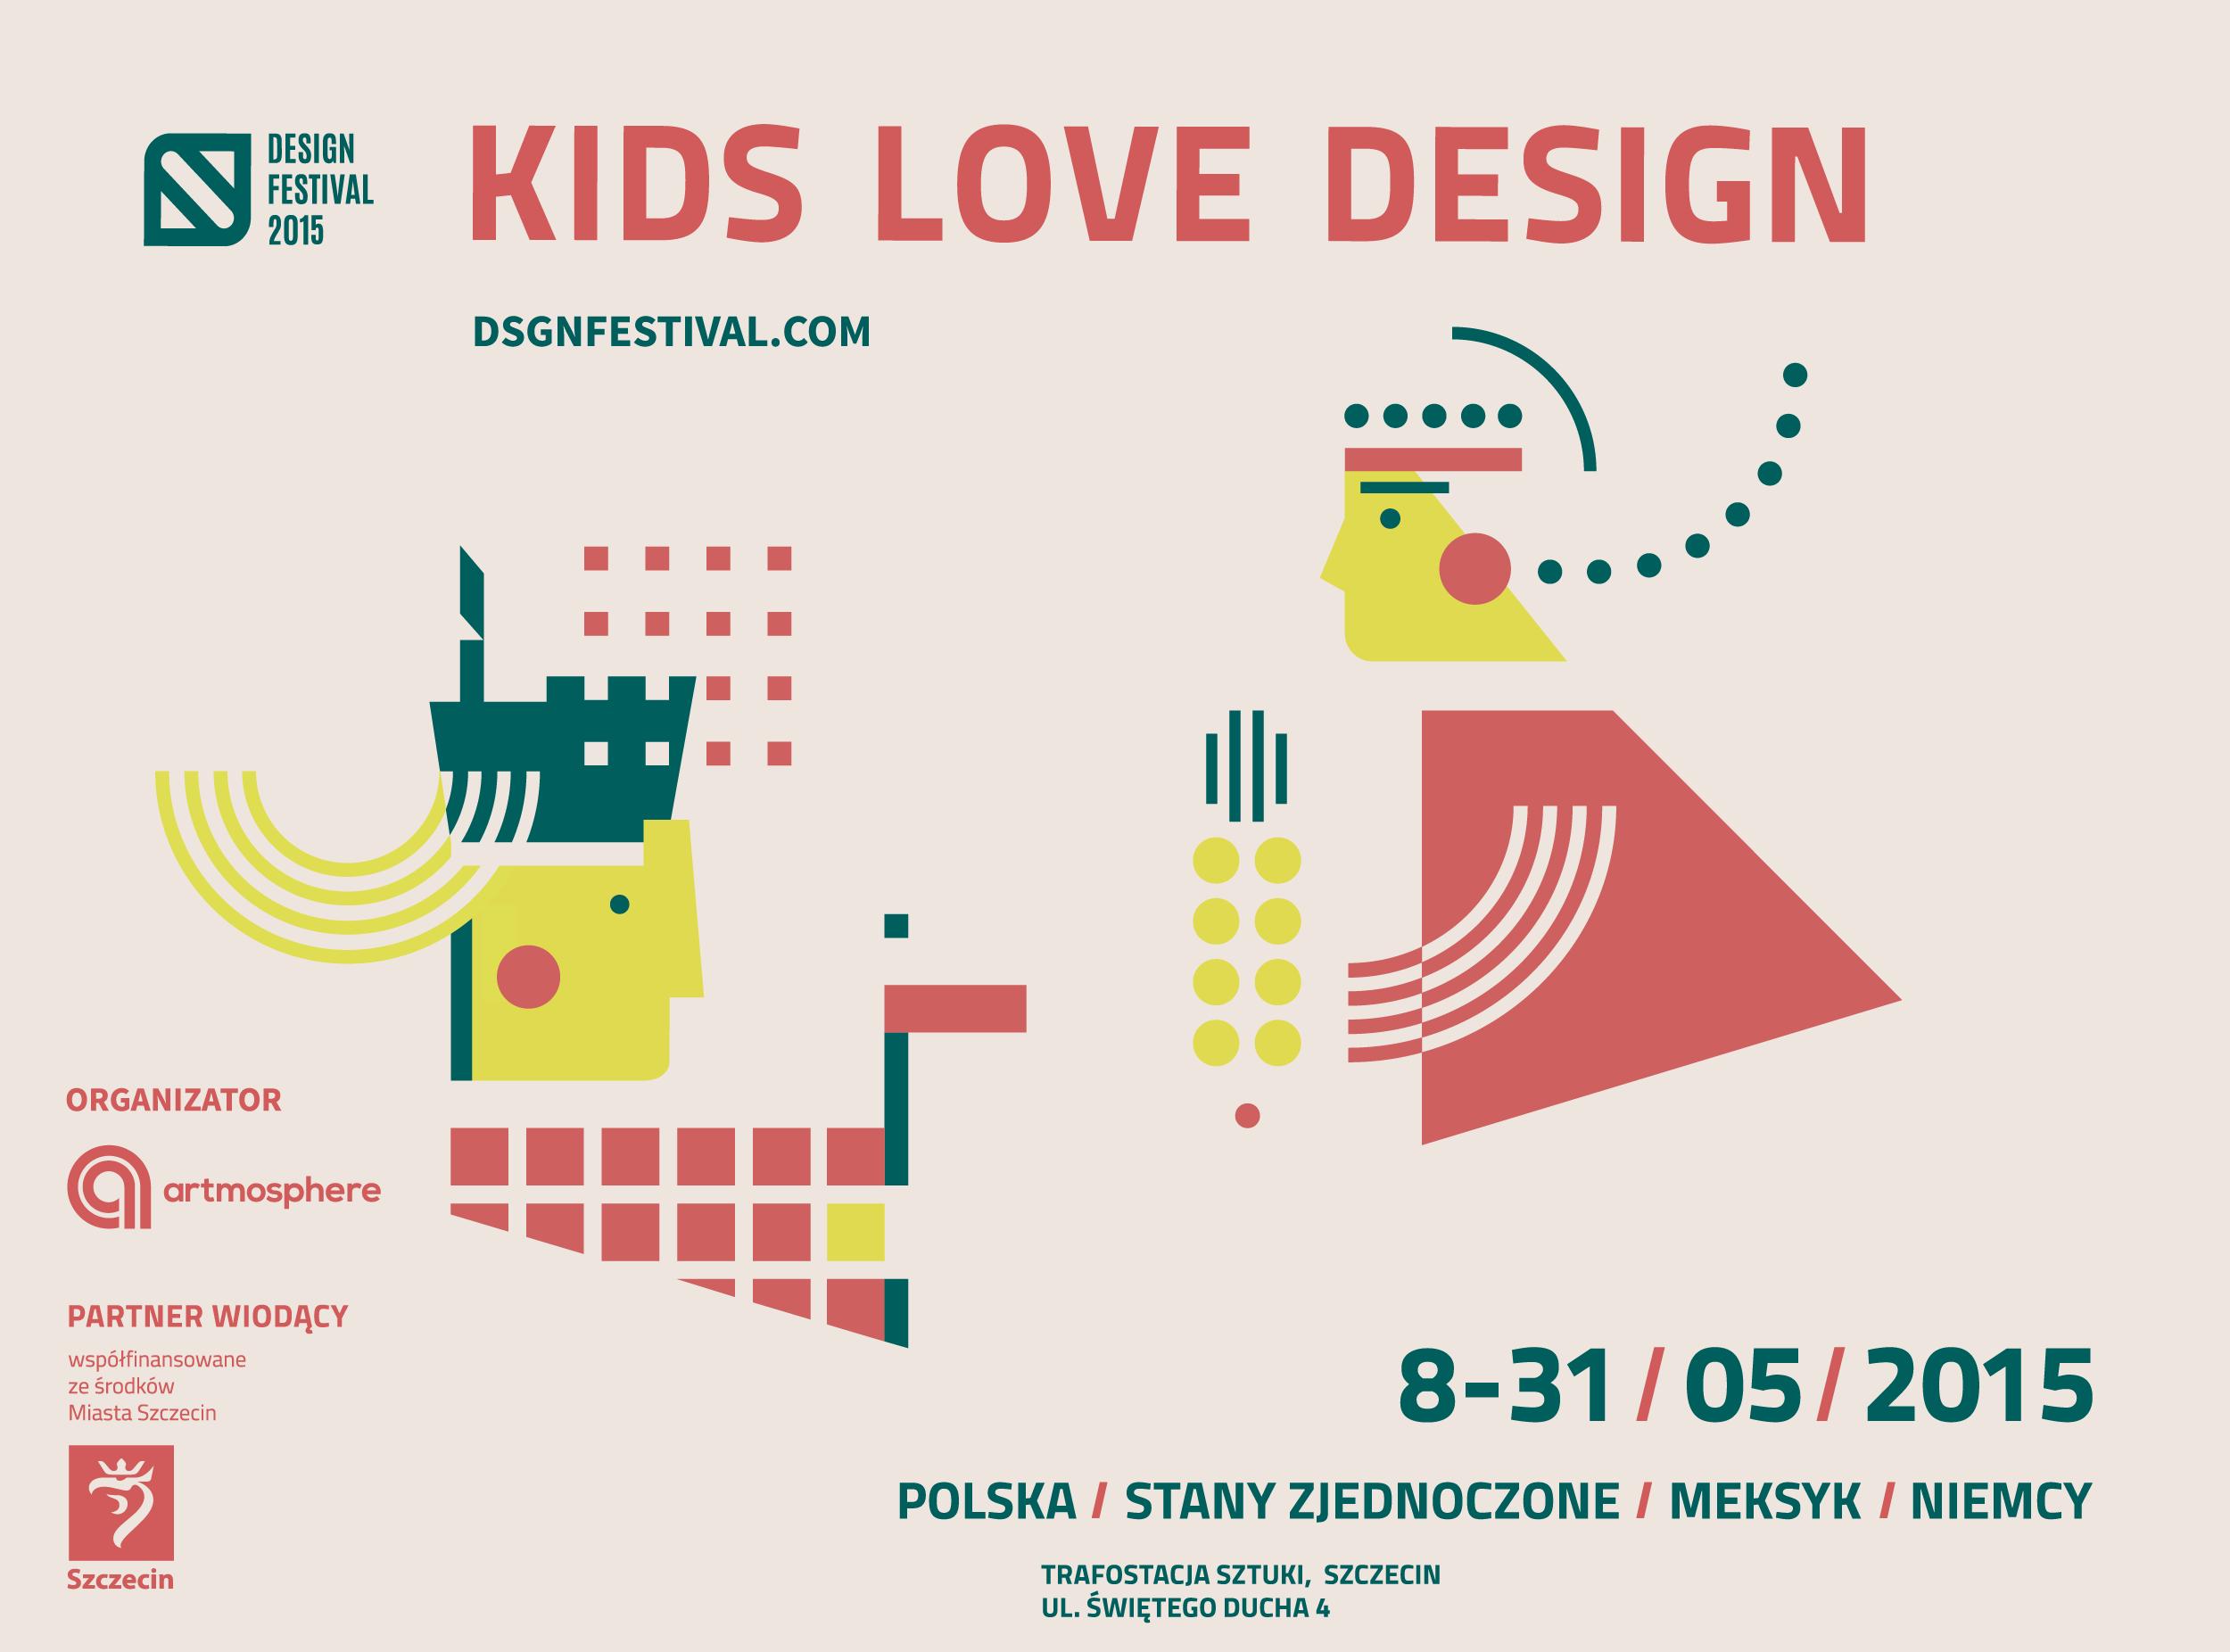 kids love design pierwszy w polsce festiwal wzornictwa dla dzieci kikimora. Black Bedroom Furniture Sets. Home Design Ideas